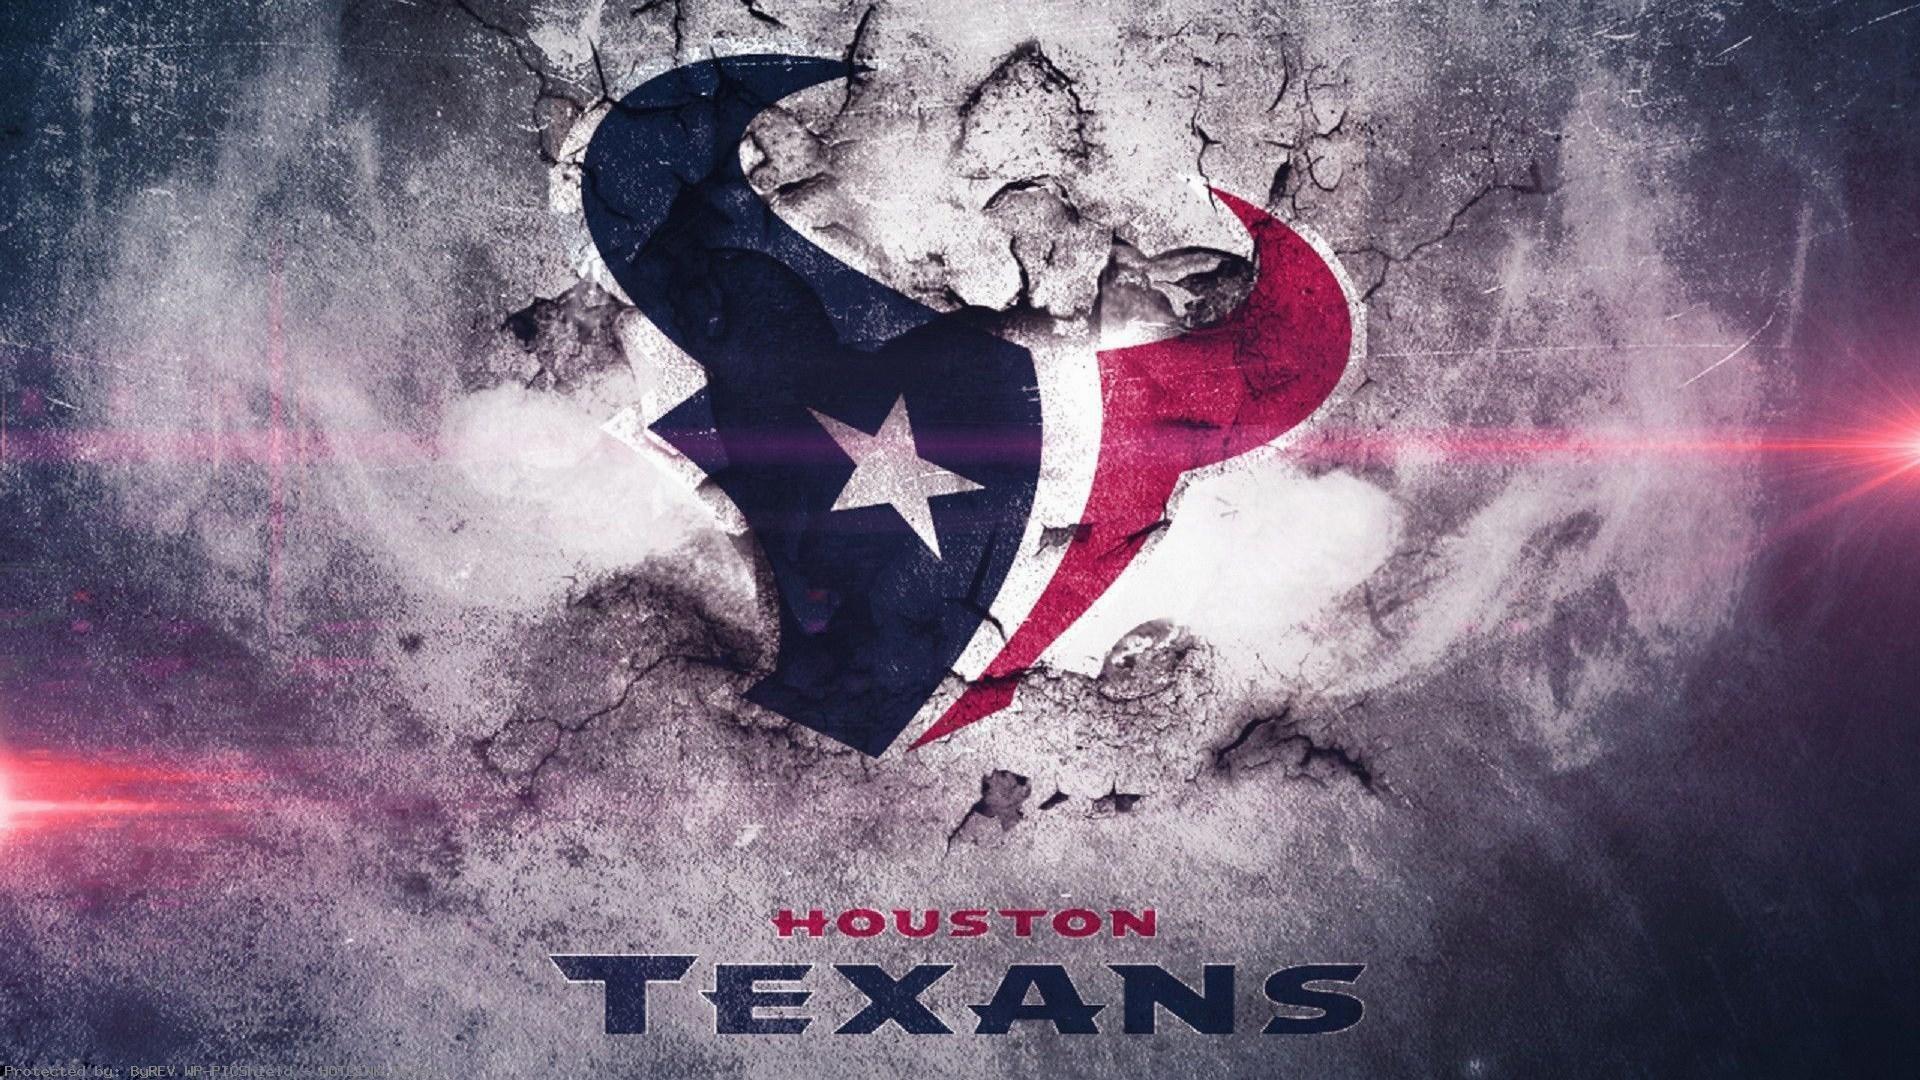 Amazing-texans-picture-Coburn-Round-1920×1080-wallpaper-wp3802338